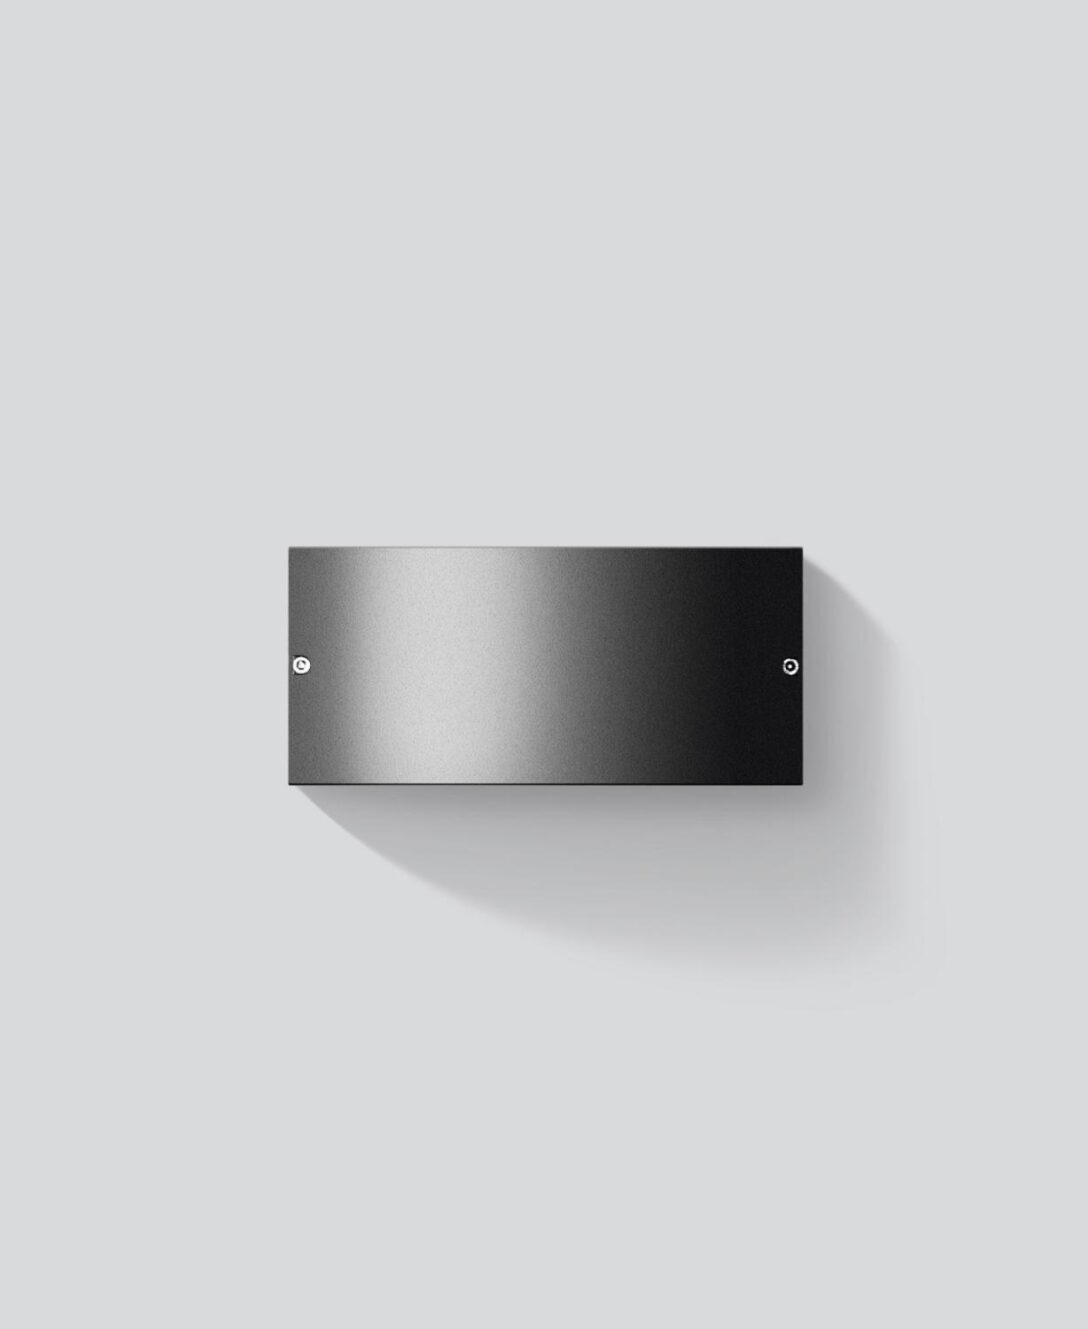 Large Size of Wandleuchte Dimmbar Linestra Led Batterie Schlafzimmer Wandleuchten Innen Bega Mit Zweiseitigem Lichtaustritt Badezimmer Bad Wohnzimmer Wandleuchte Dimmbar